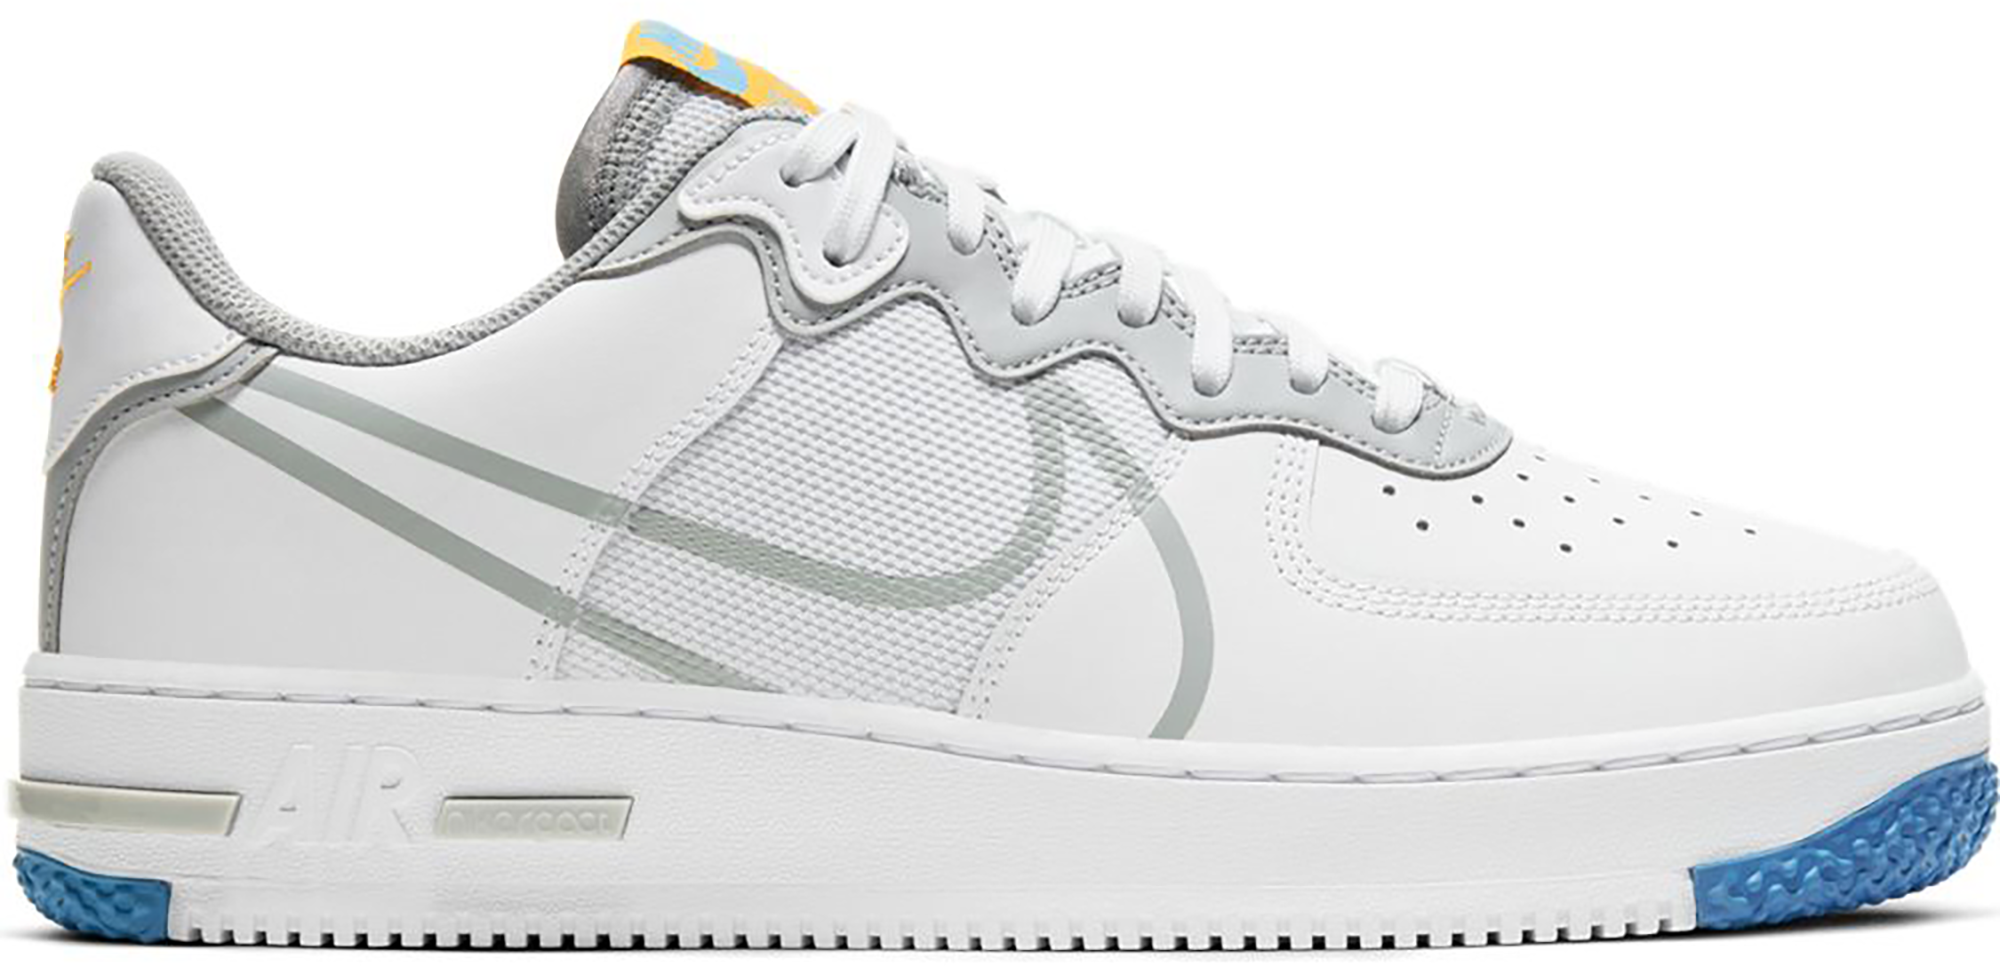 Nike Air Force 1 Low React White Light